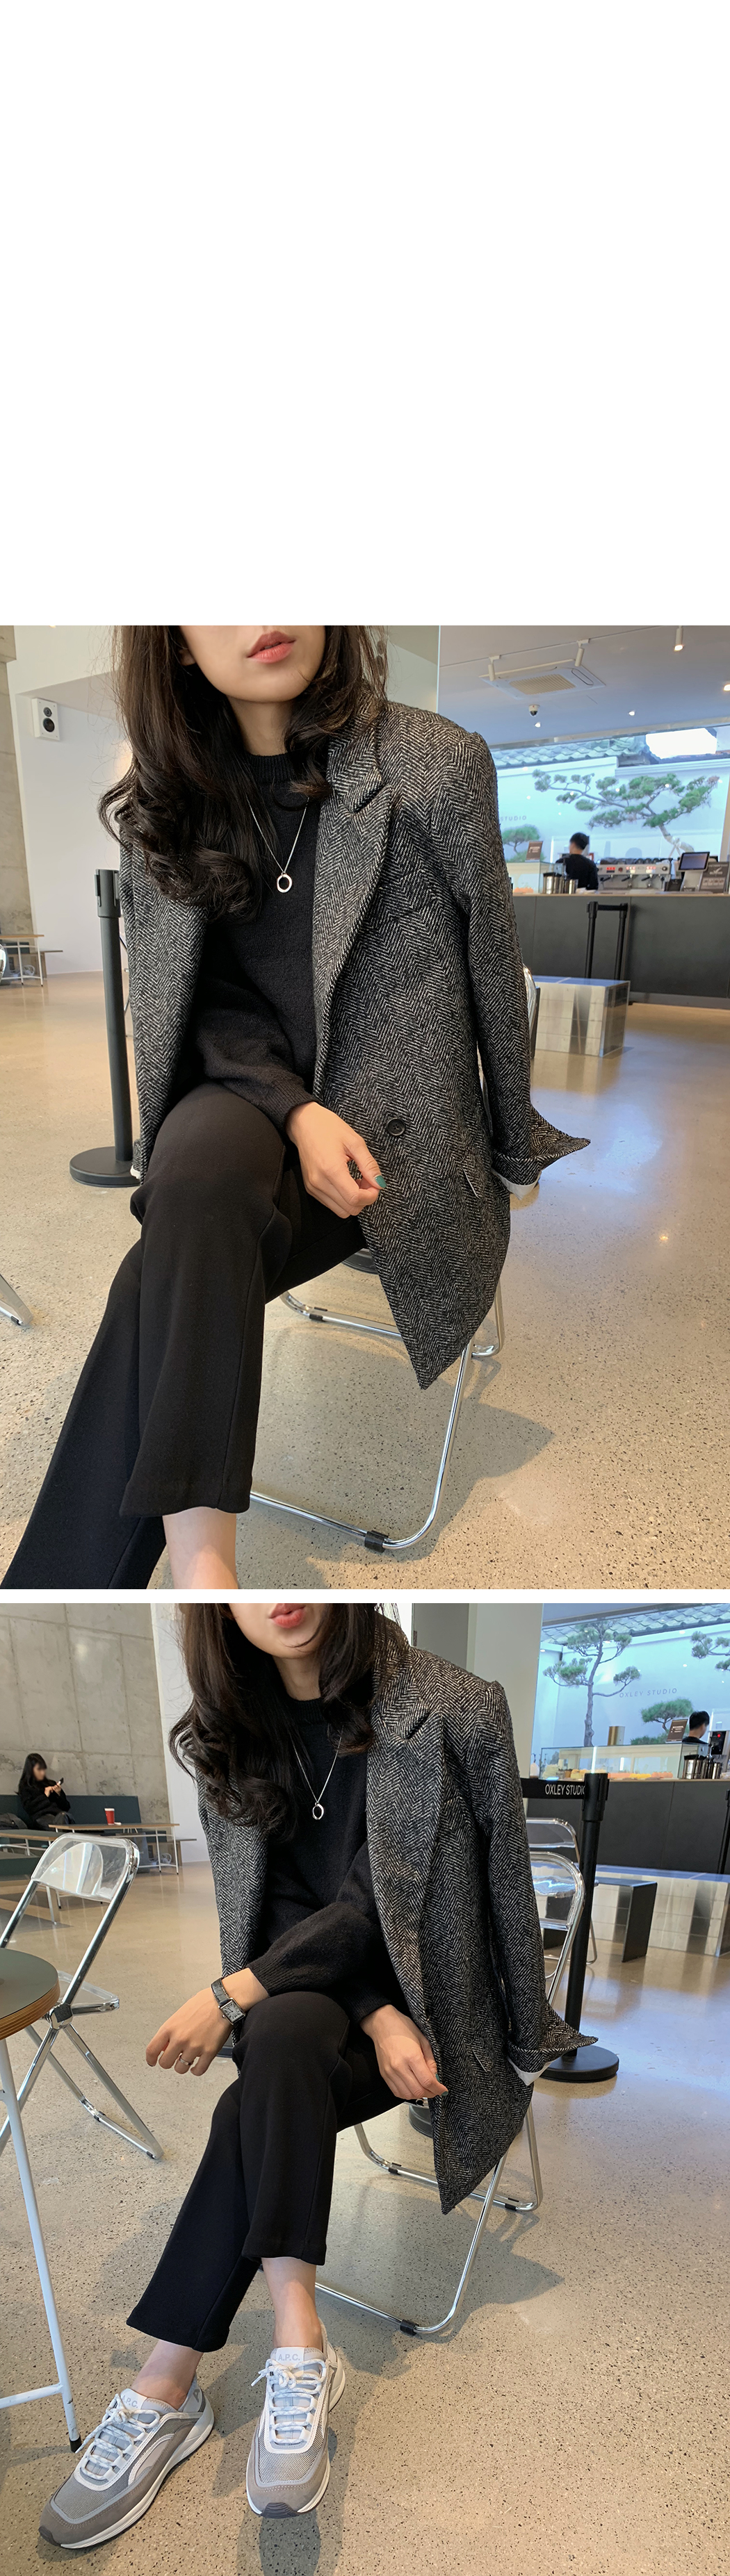 Fogney Standard Fit Knit